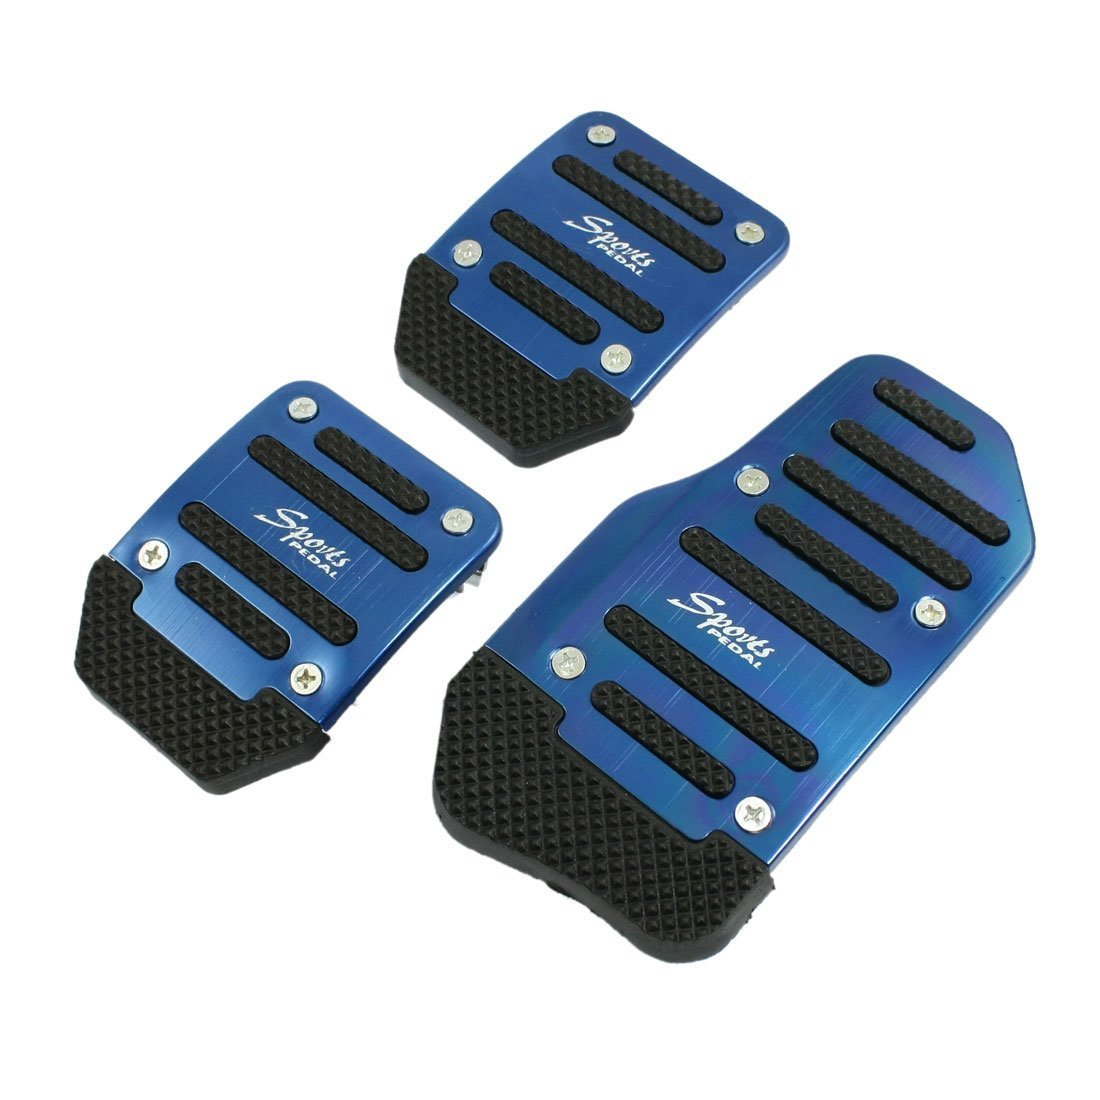 freno pie Pedal de coche cover set kit autosunshine 3/Pcs Car Styling universal de aluminio de transmisi/ón manual antideslizante metal pl/ástico